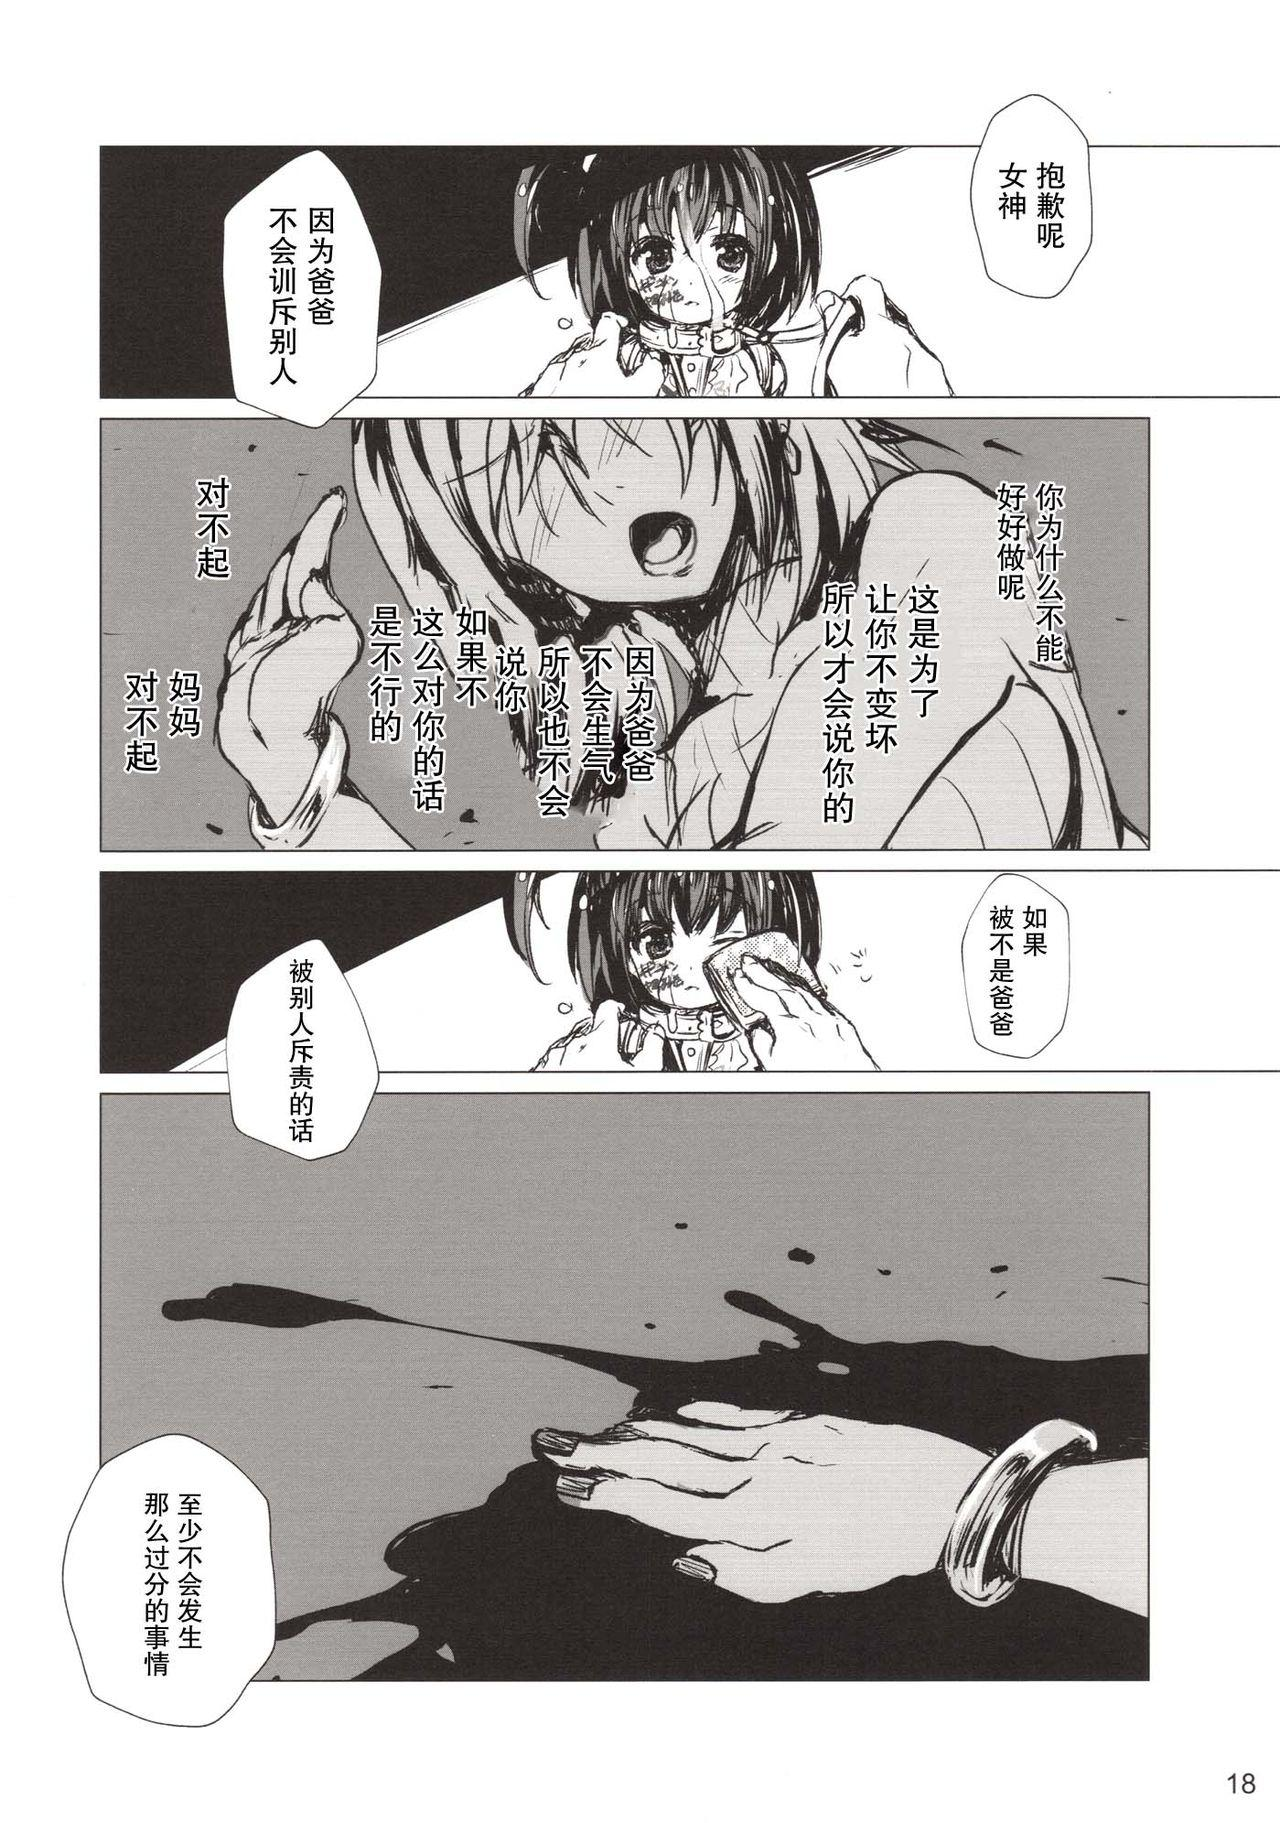 (C94) [SPT (Kouguchi Moto)] Rakugaki Benjo no Megami-chan[Chinese]【不可视汉化】 17